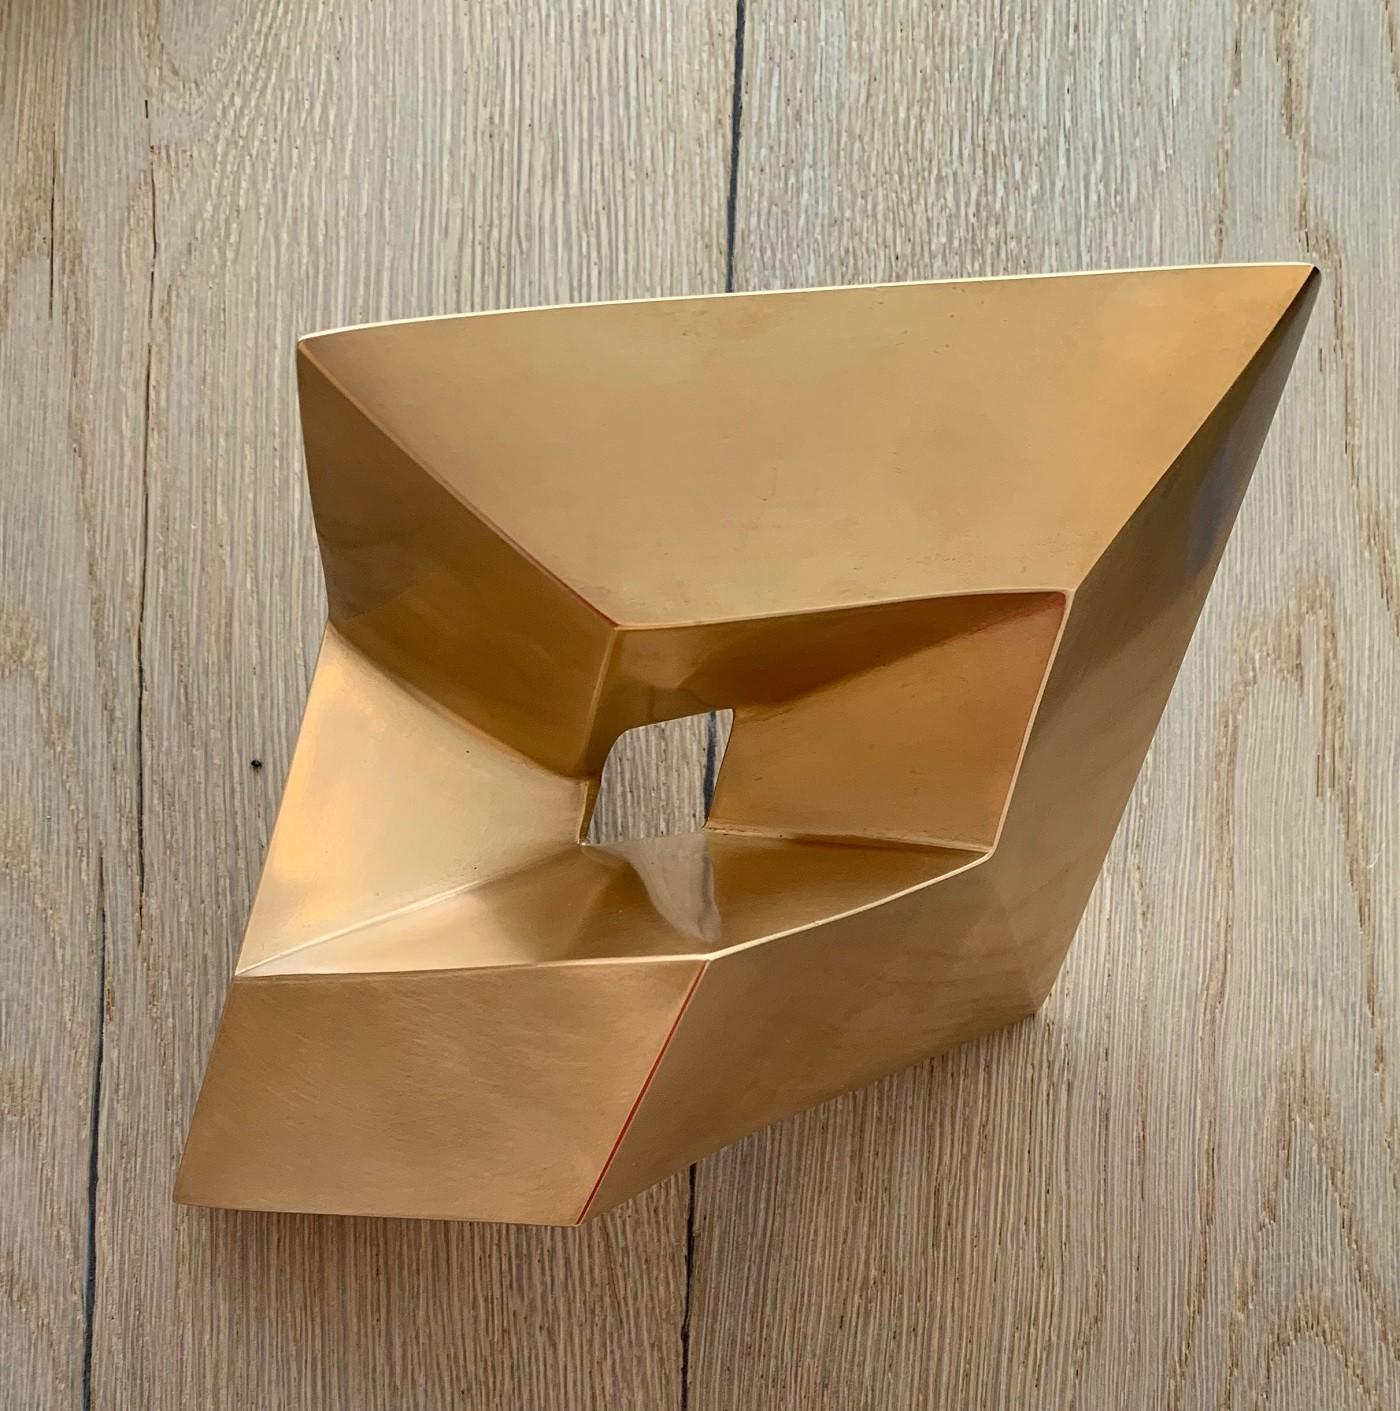 Streched Cube - Verhas, Maximilian - k-VR118